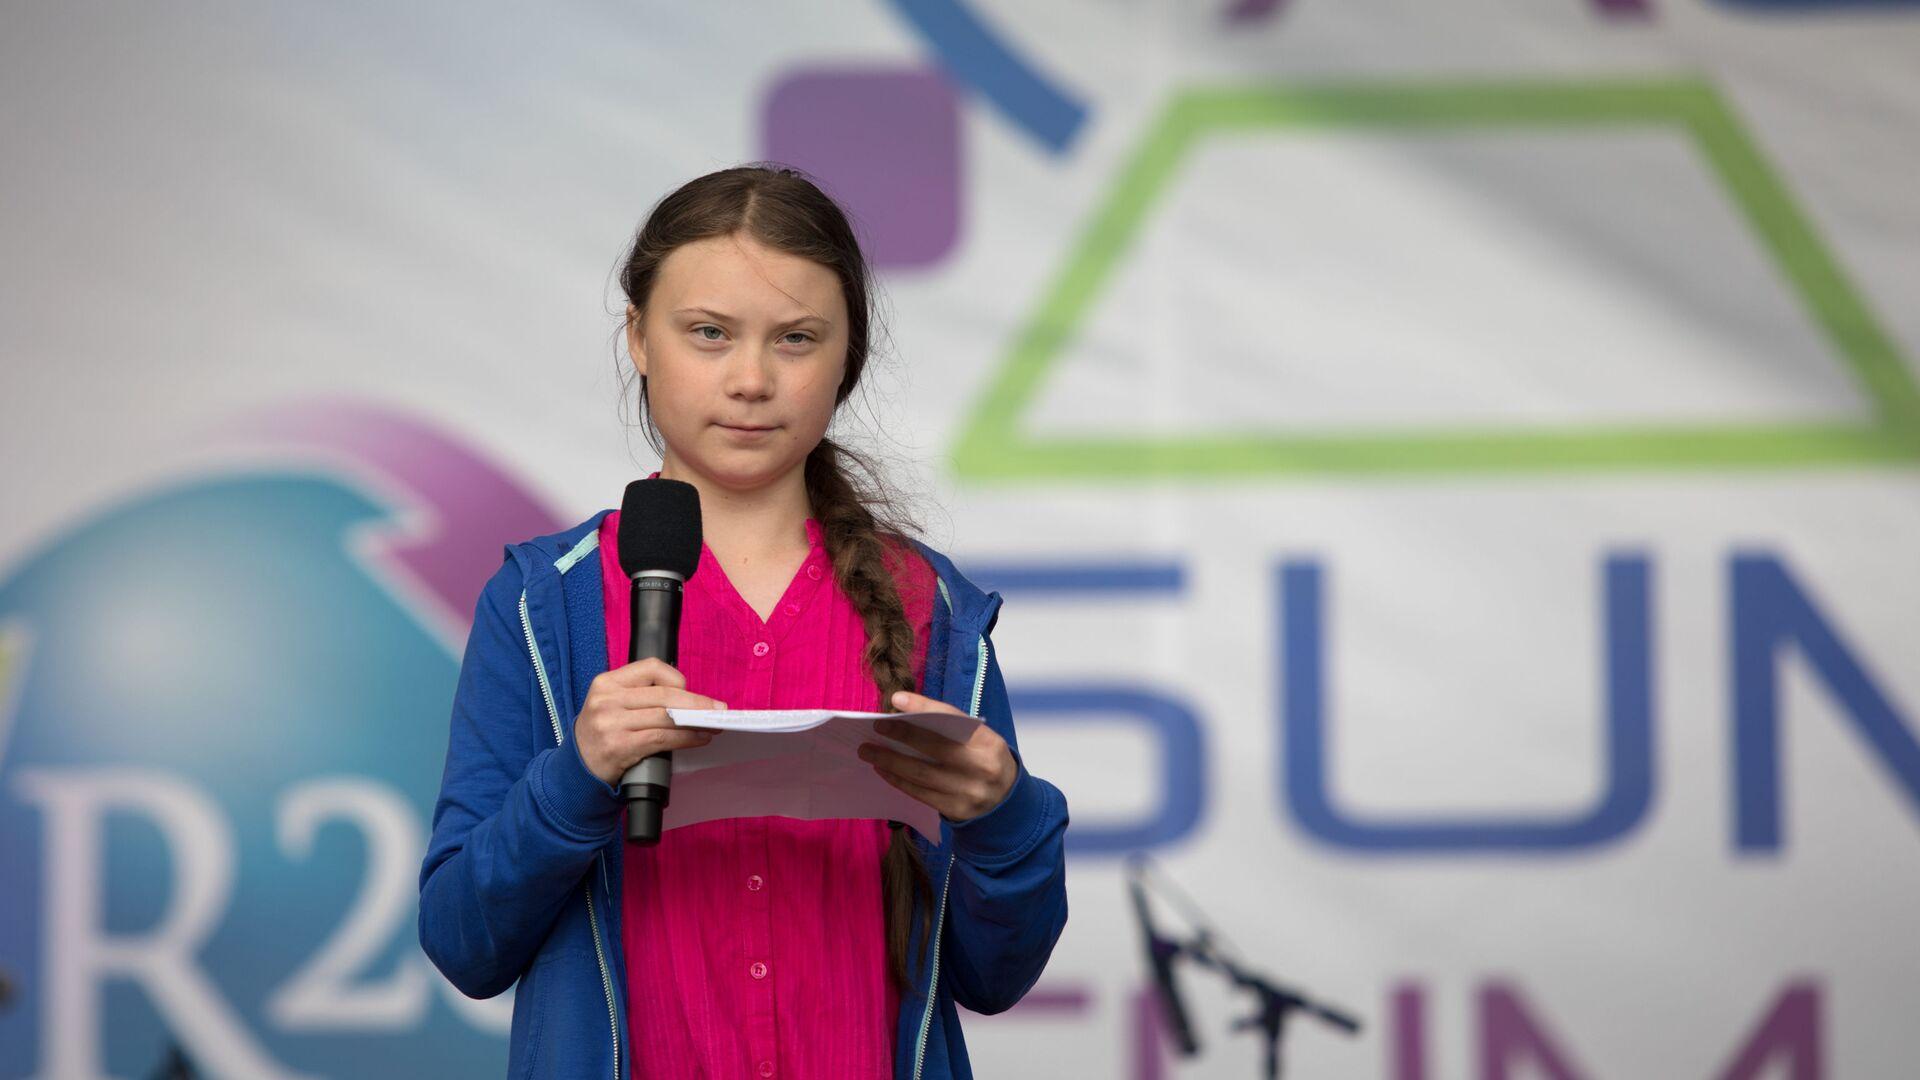 Greta Thunberg parla al Summit sul clima a Vienna - Sputnik Italia, 1920, 31.08.2021